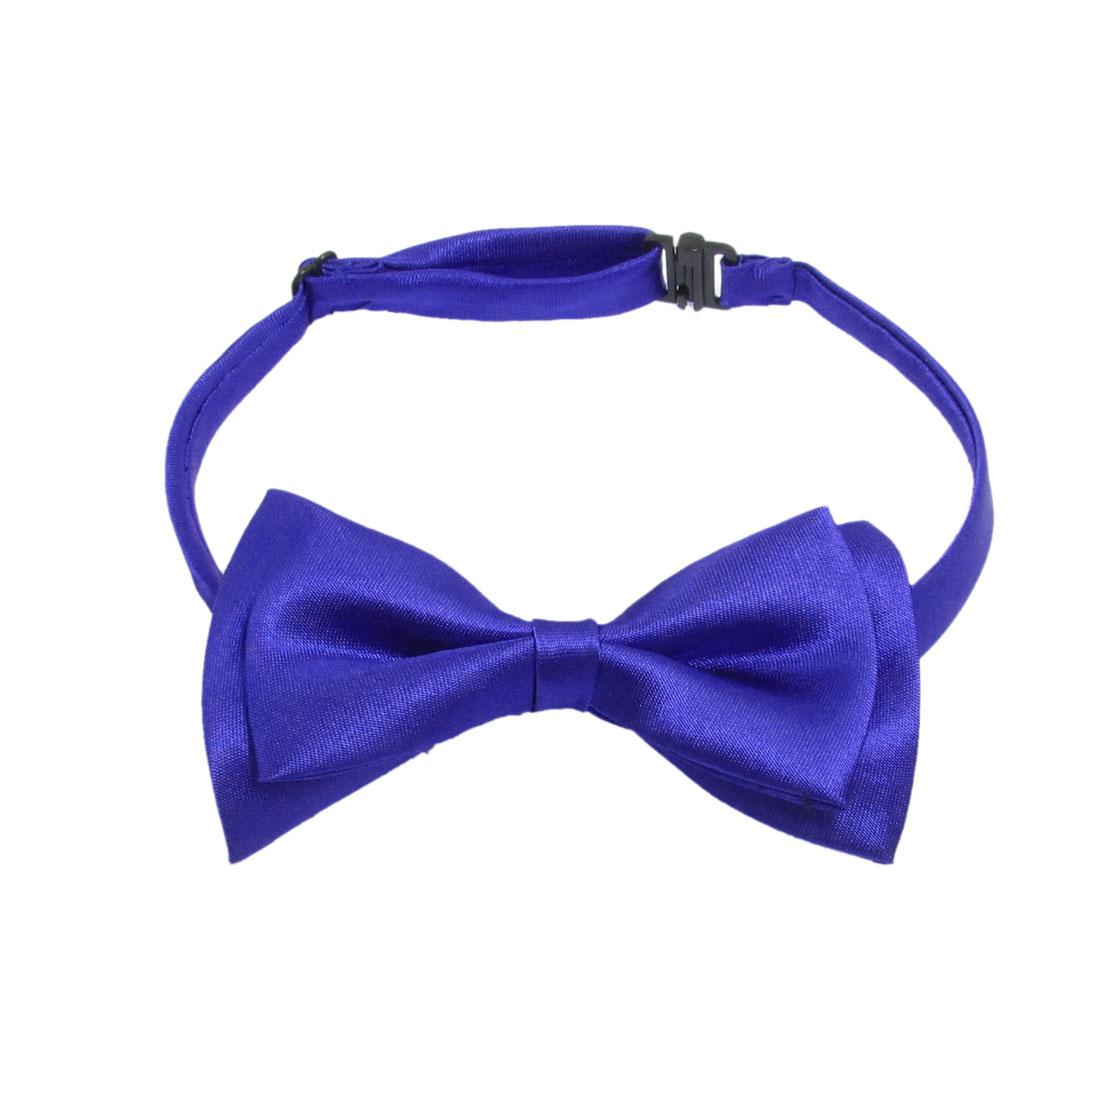 "Men's 4"" Width Blue Two Layer Bowknot Plastic Interlock Buckle Bow Tie"